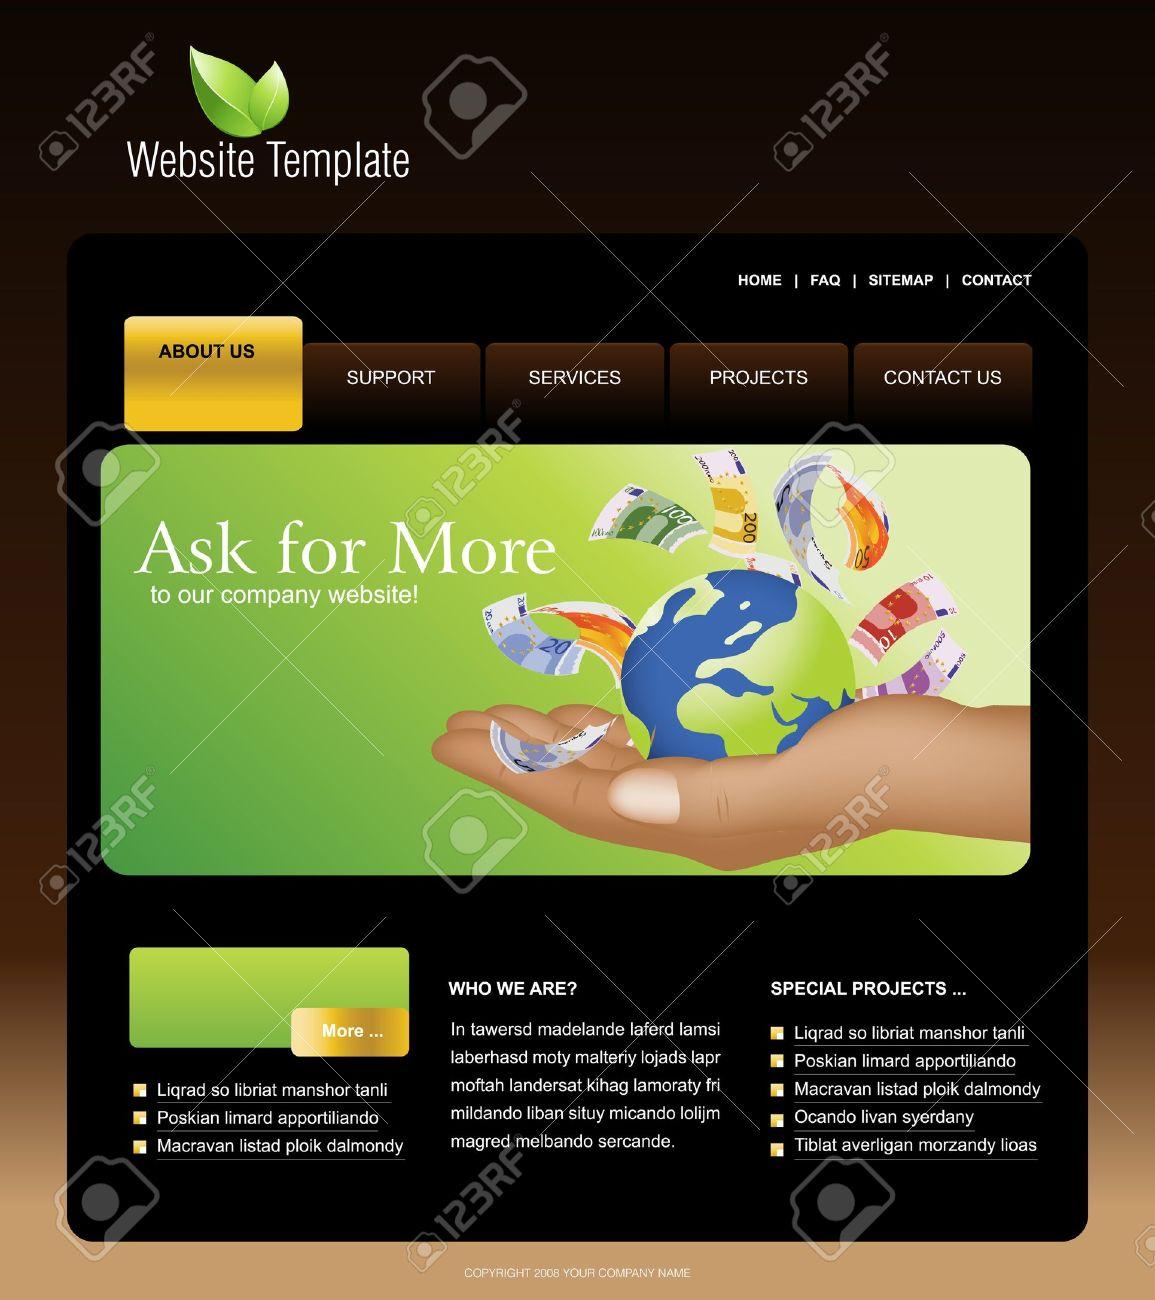 Illustrator Web Templates. using illustrator s free web templates ...